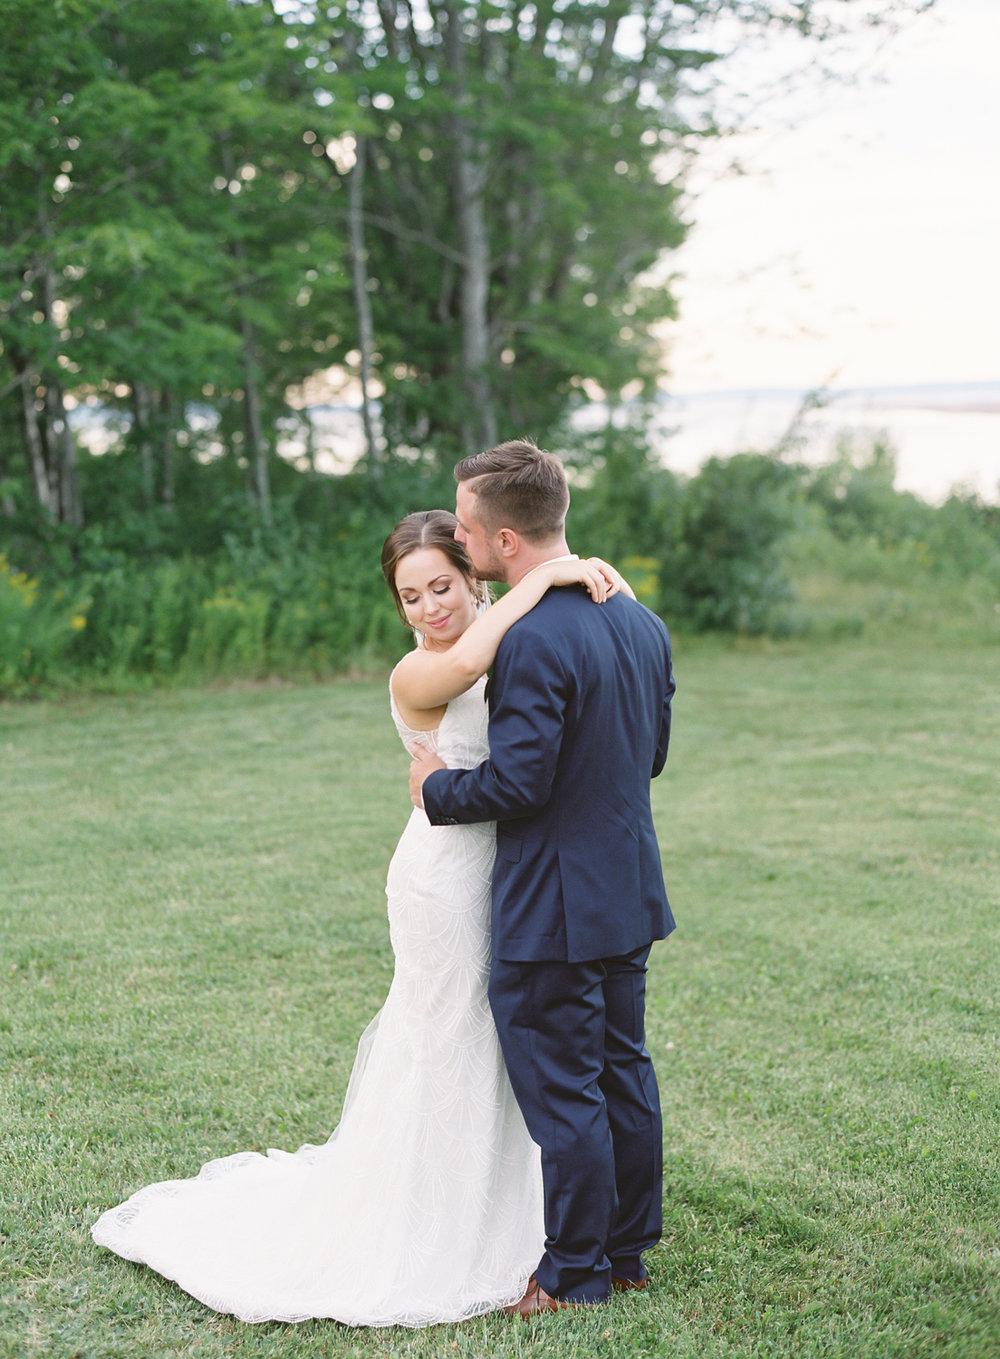 Jacqueline Anne Photography - Nova Scotia Backyard Wedding-85.jpg